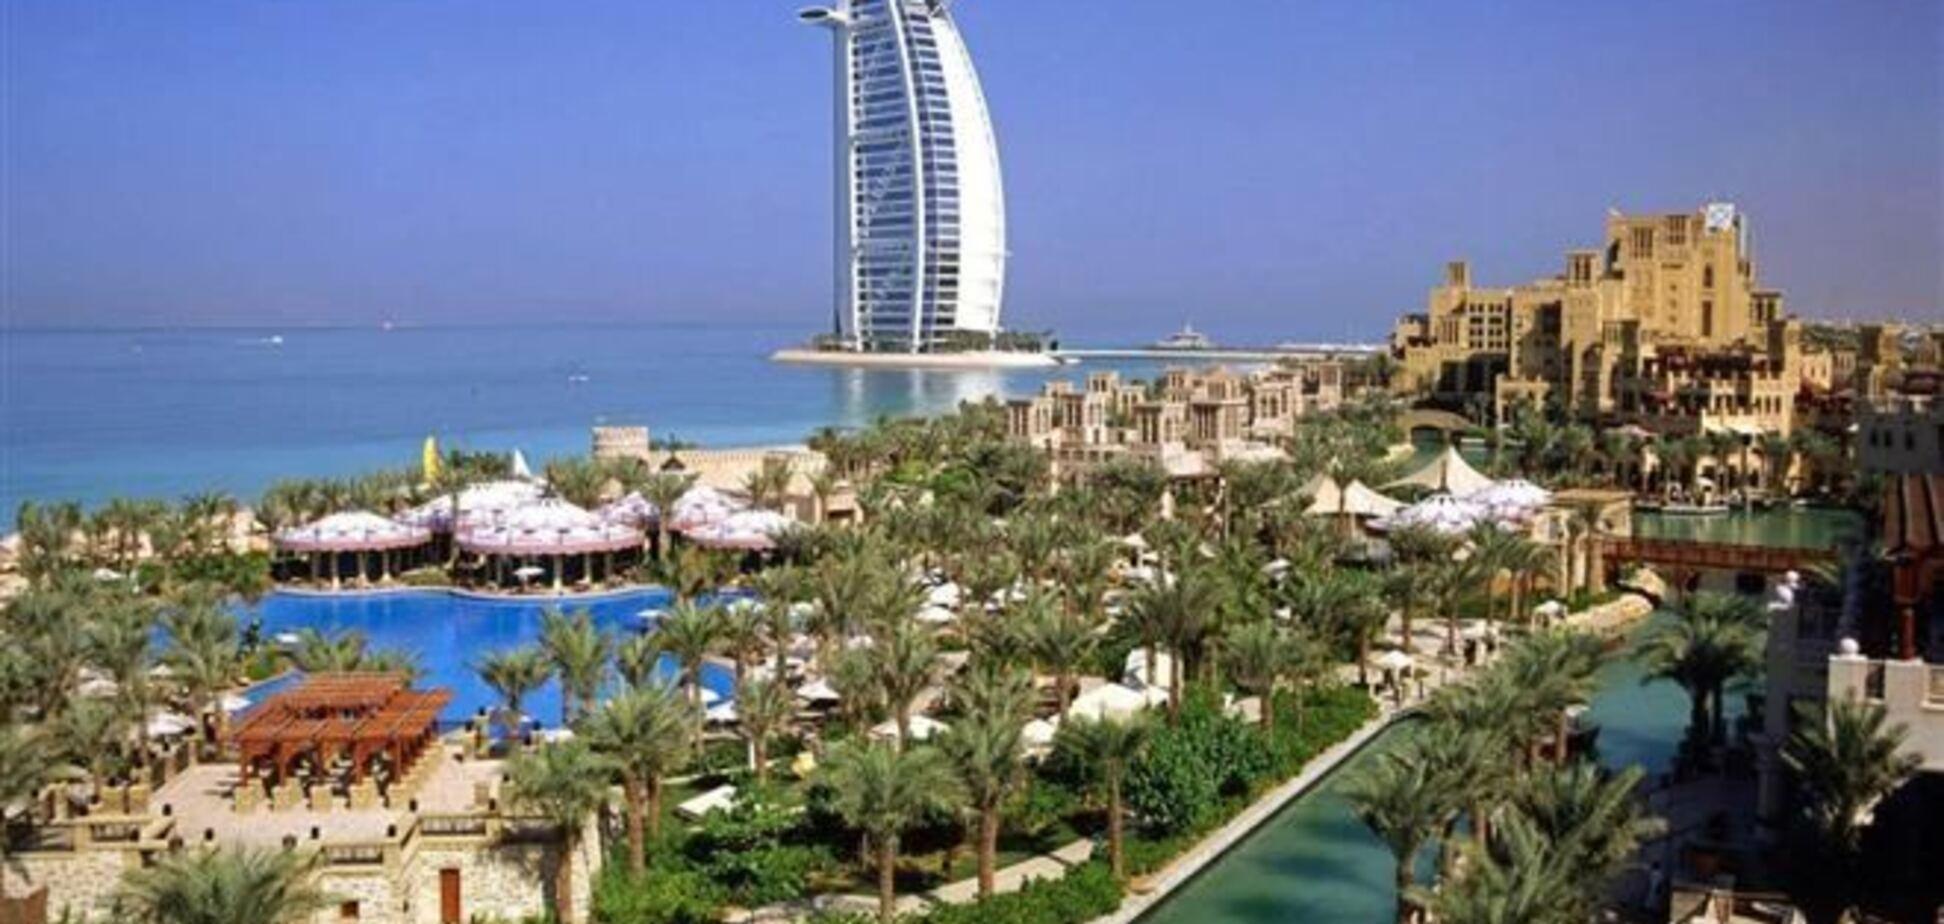 Дубай занял 4-е место в мире по легкости регистрации недвижимости